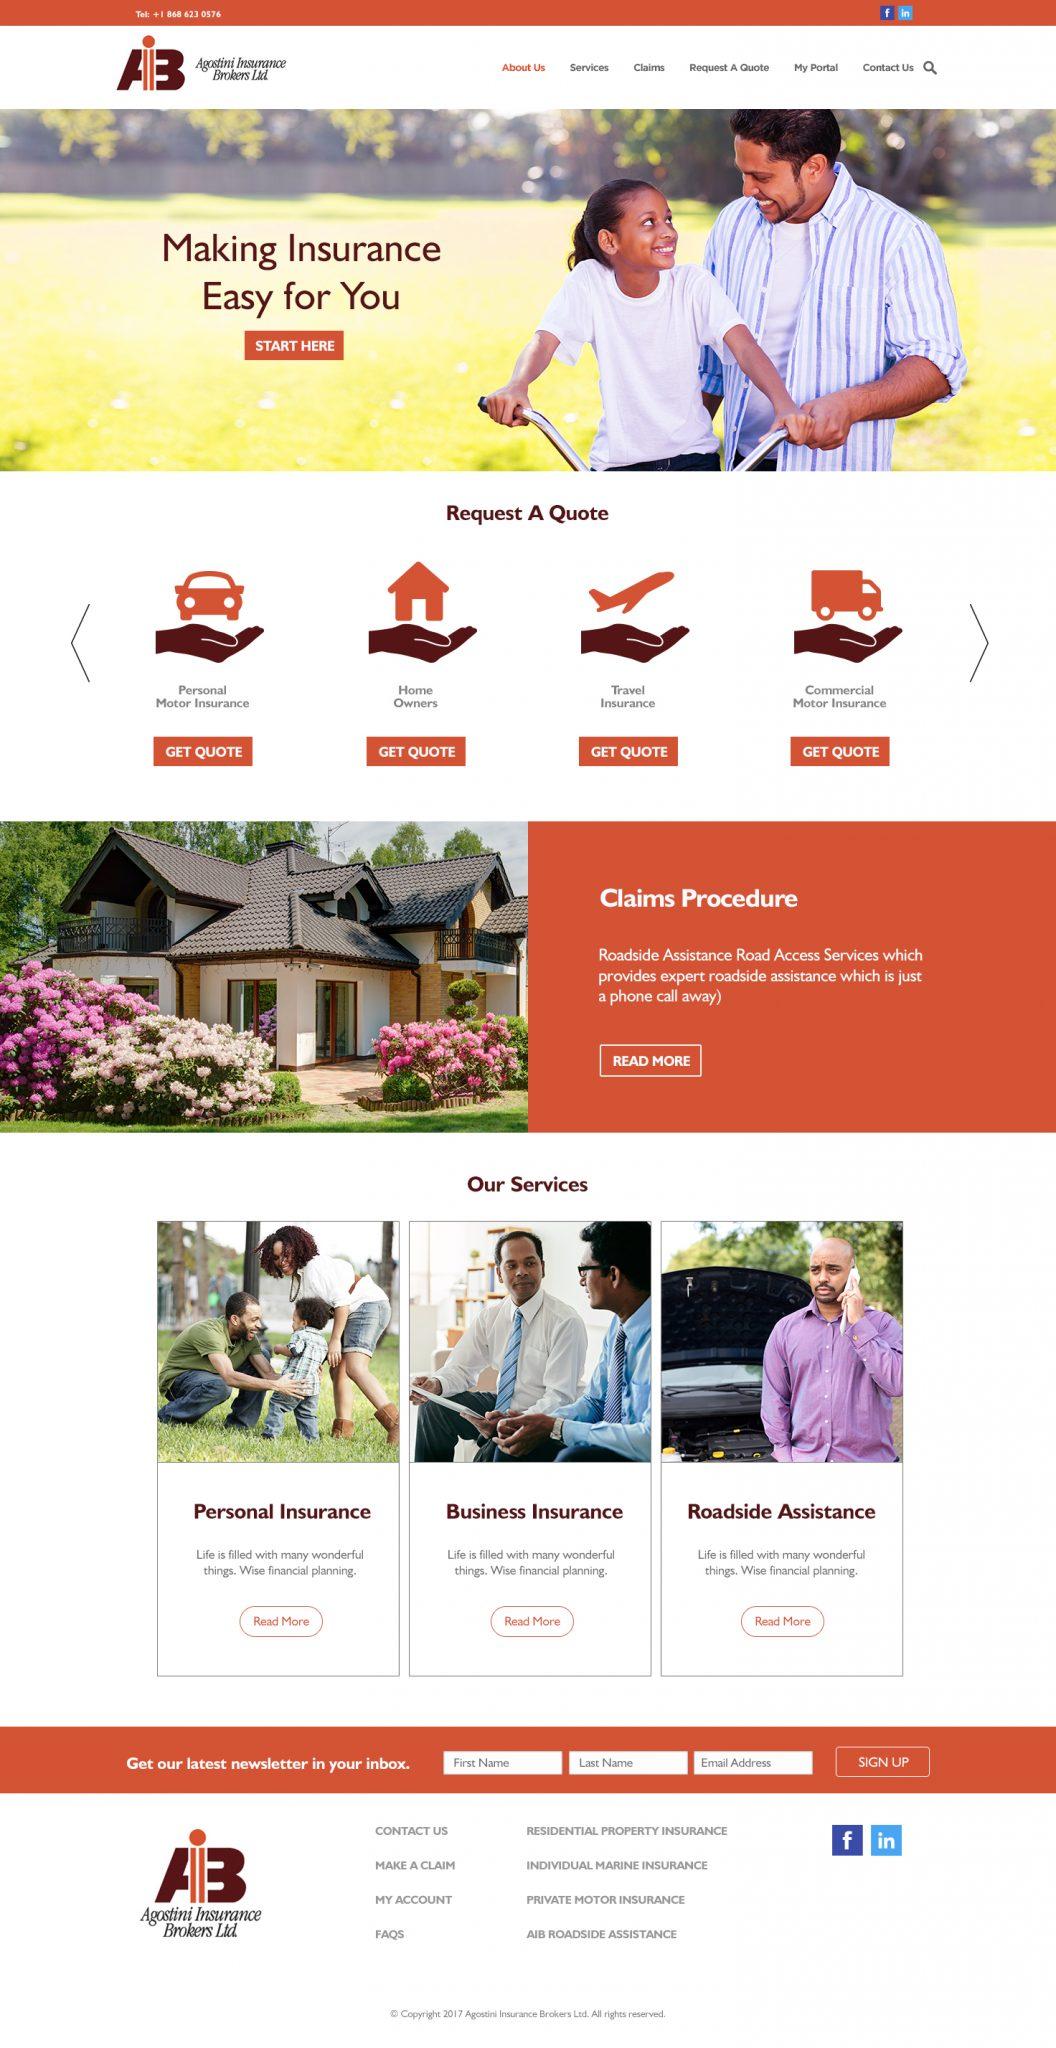 Agostini Website